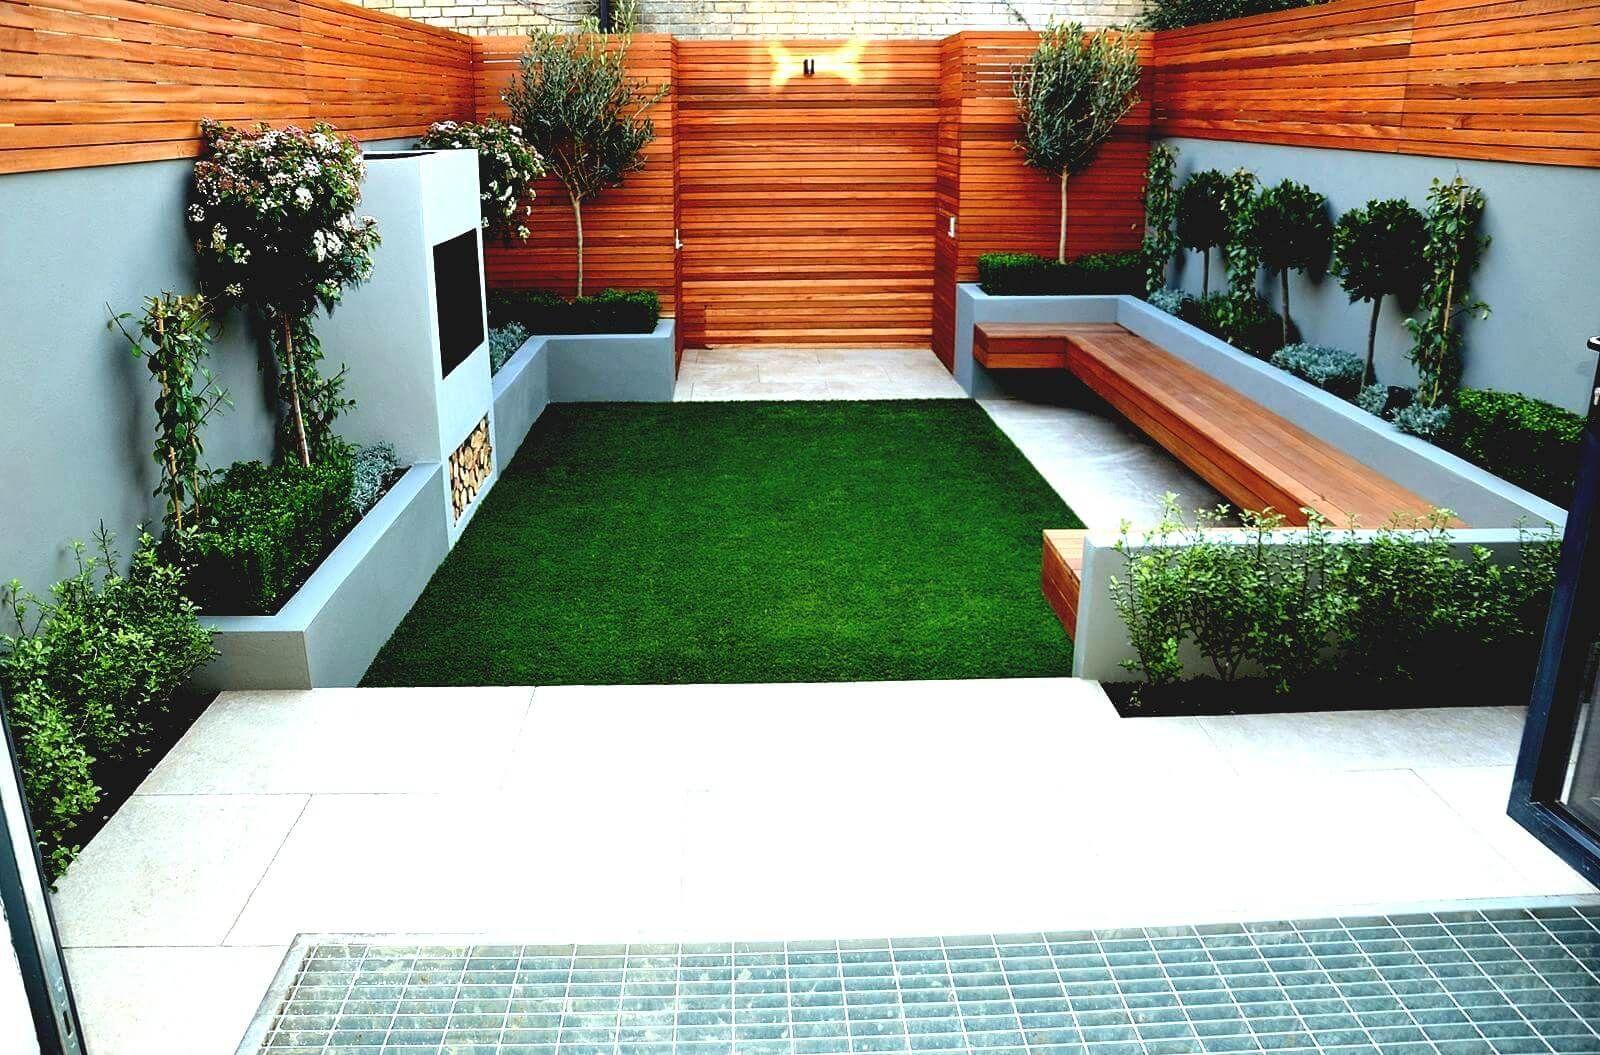 50 Best Front Garden Design Ideas in UK (With images